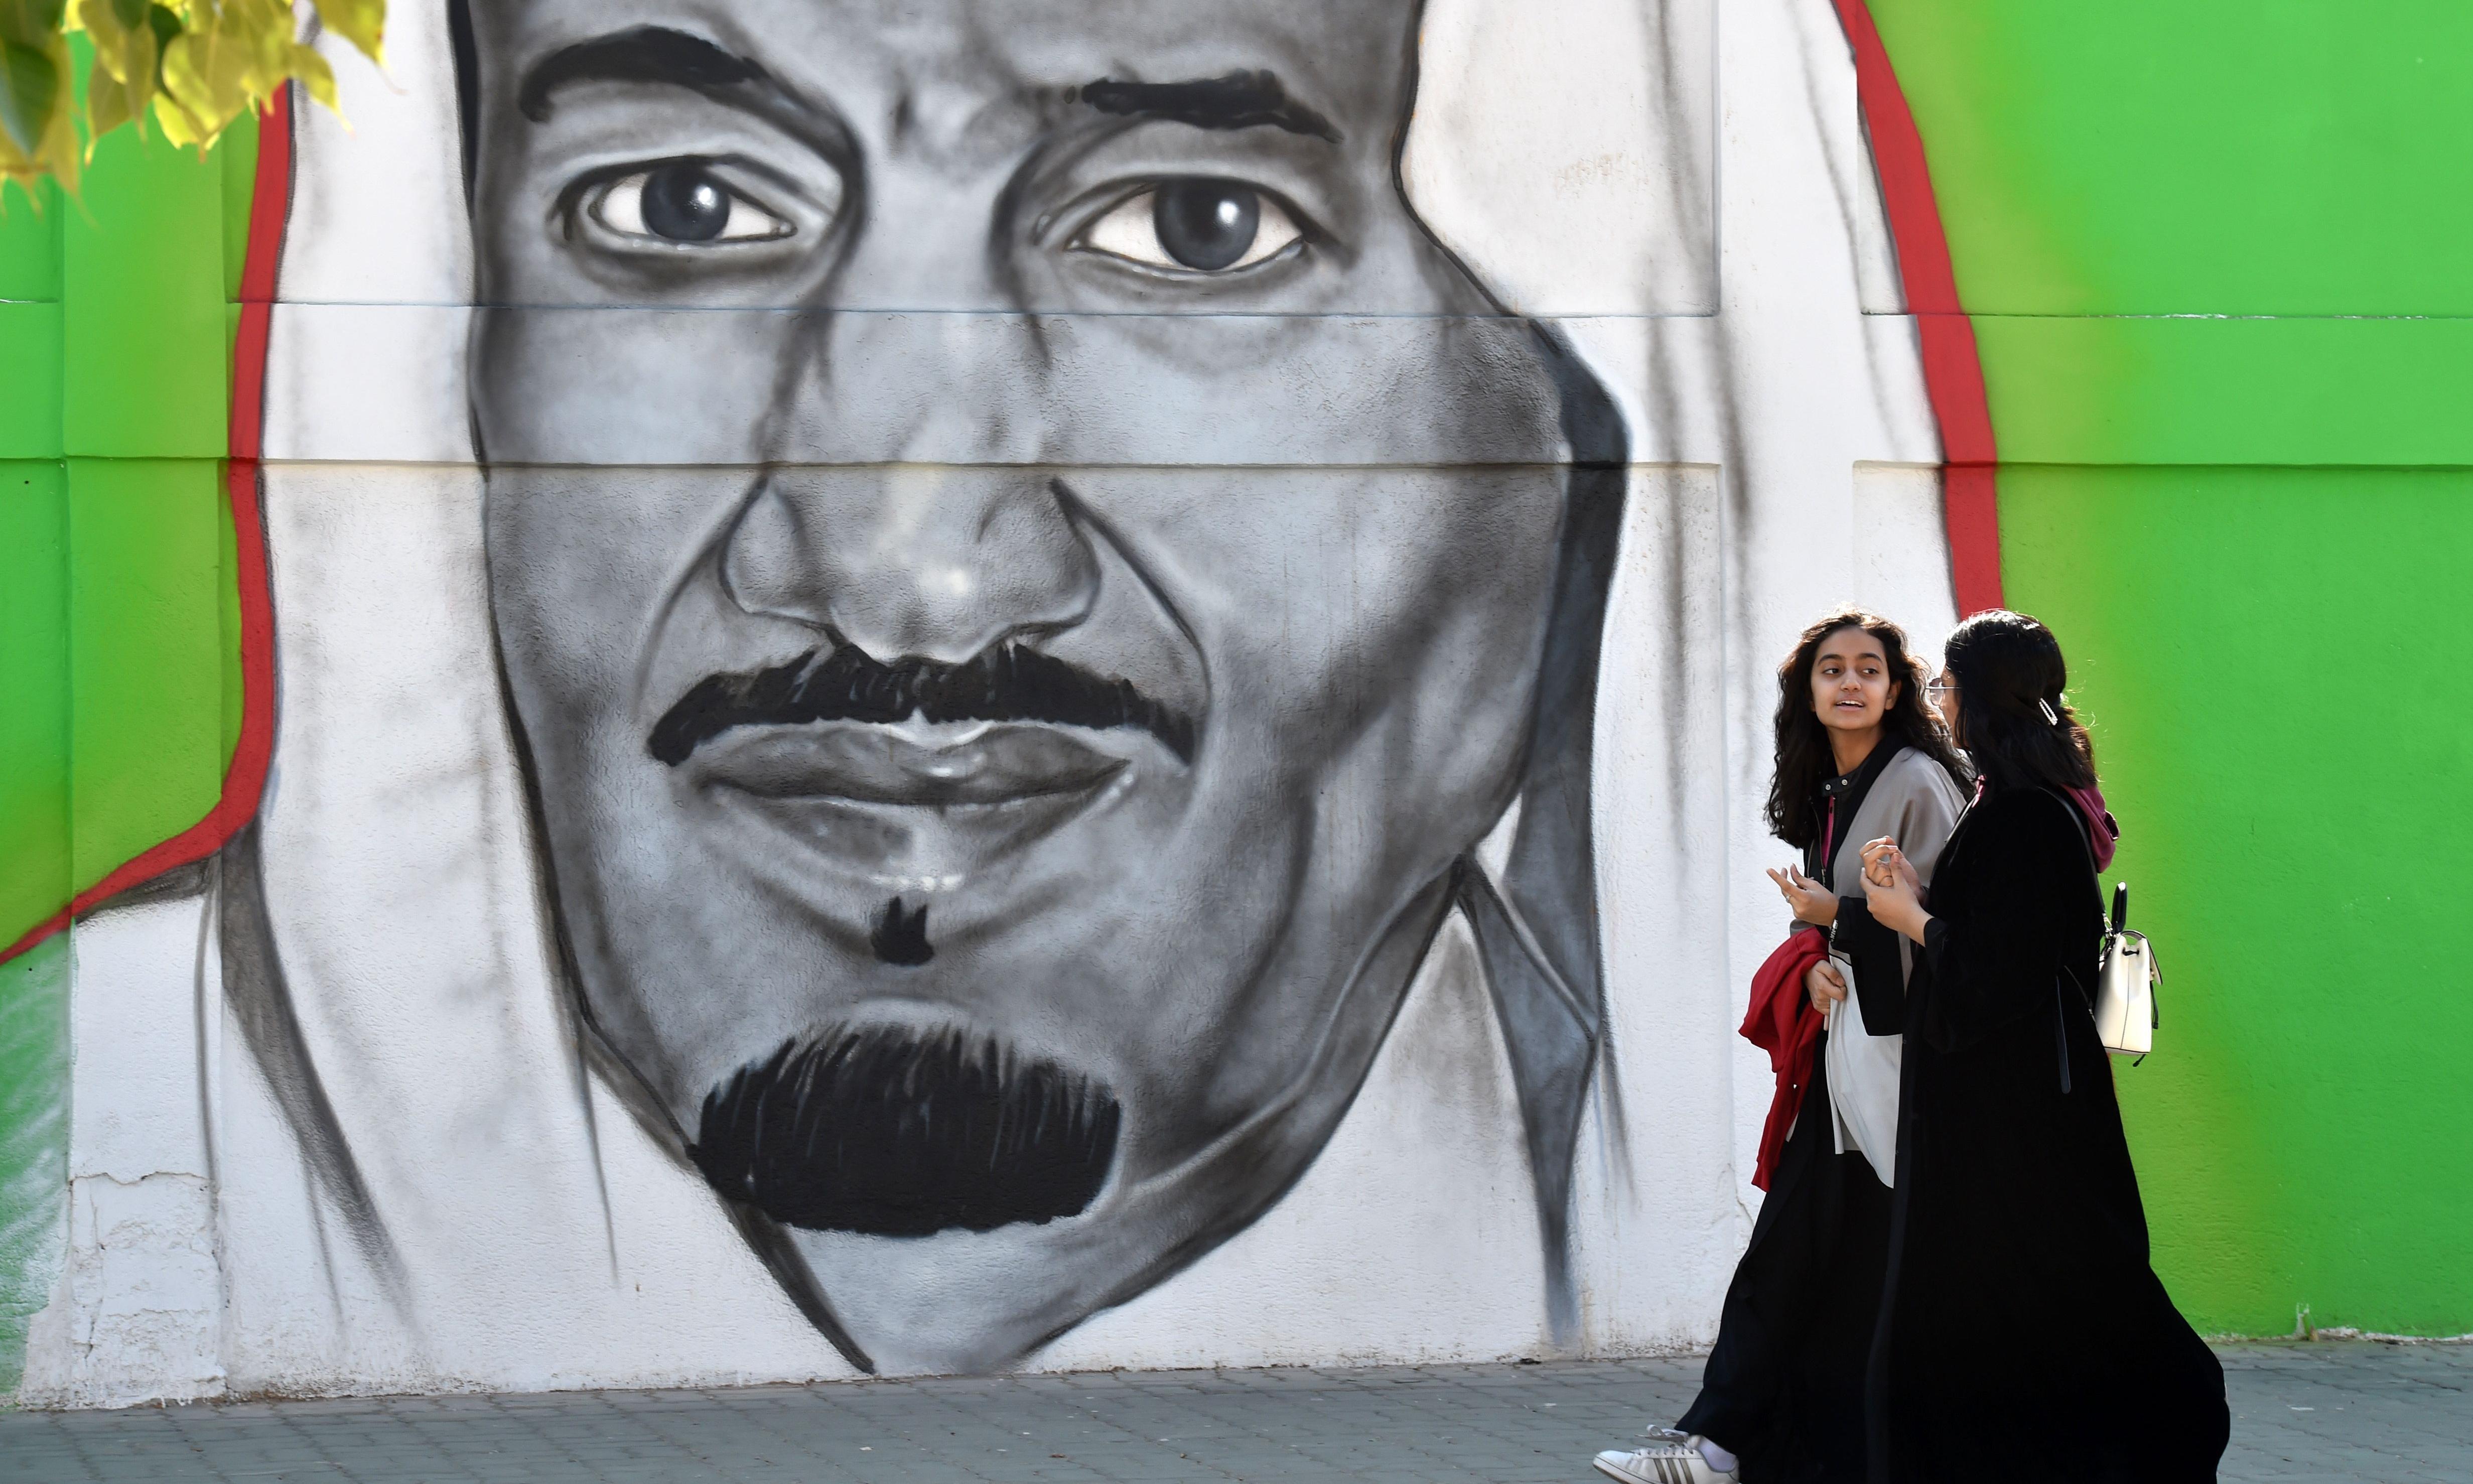 Young v old, urban v rural: cultural reforms expose Saudi fault lines